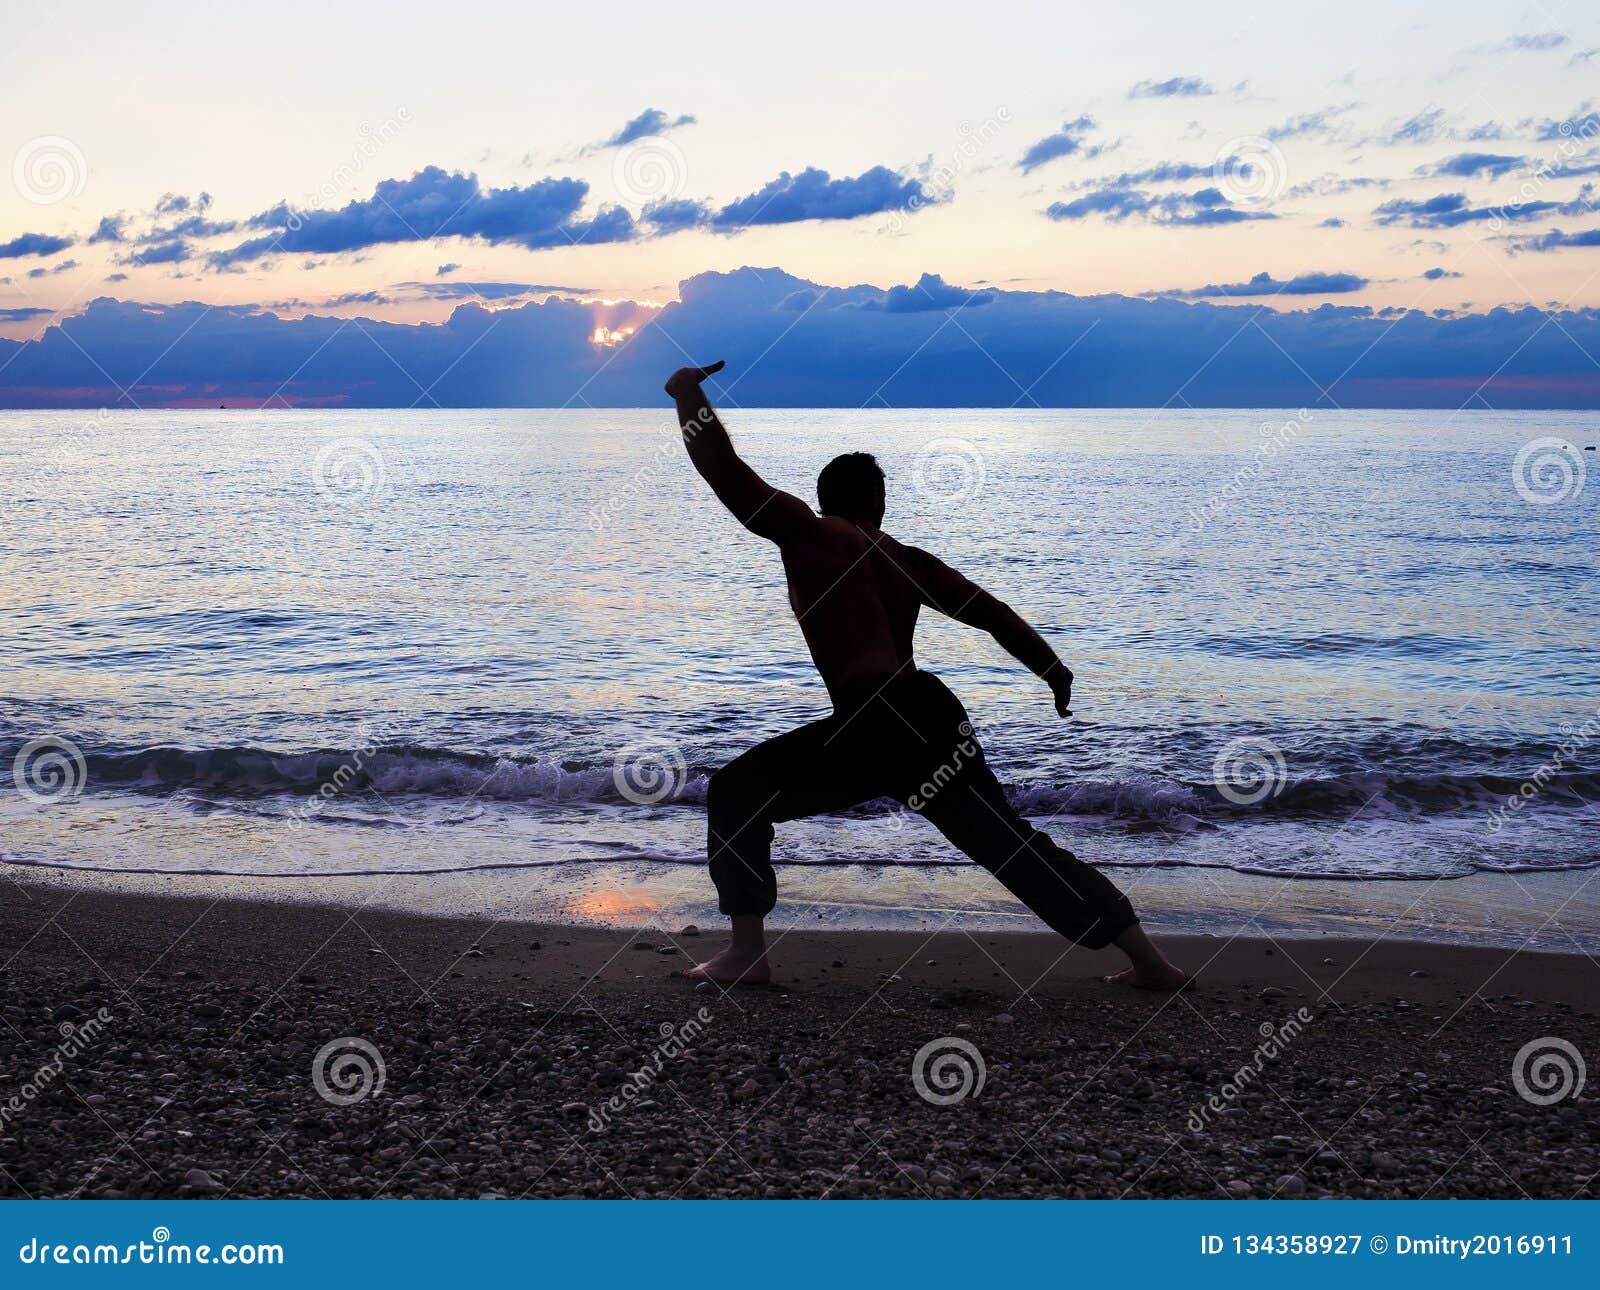 Man Practising Wushu at Sunset. Silhouette of a man on sunset.